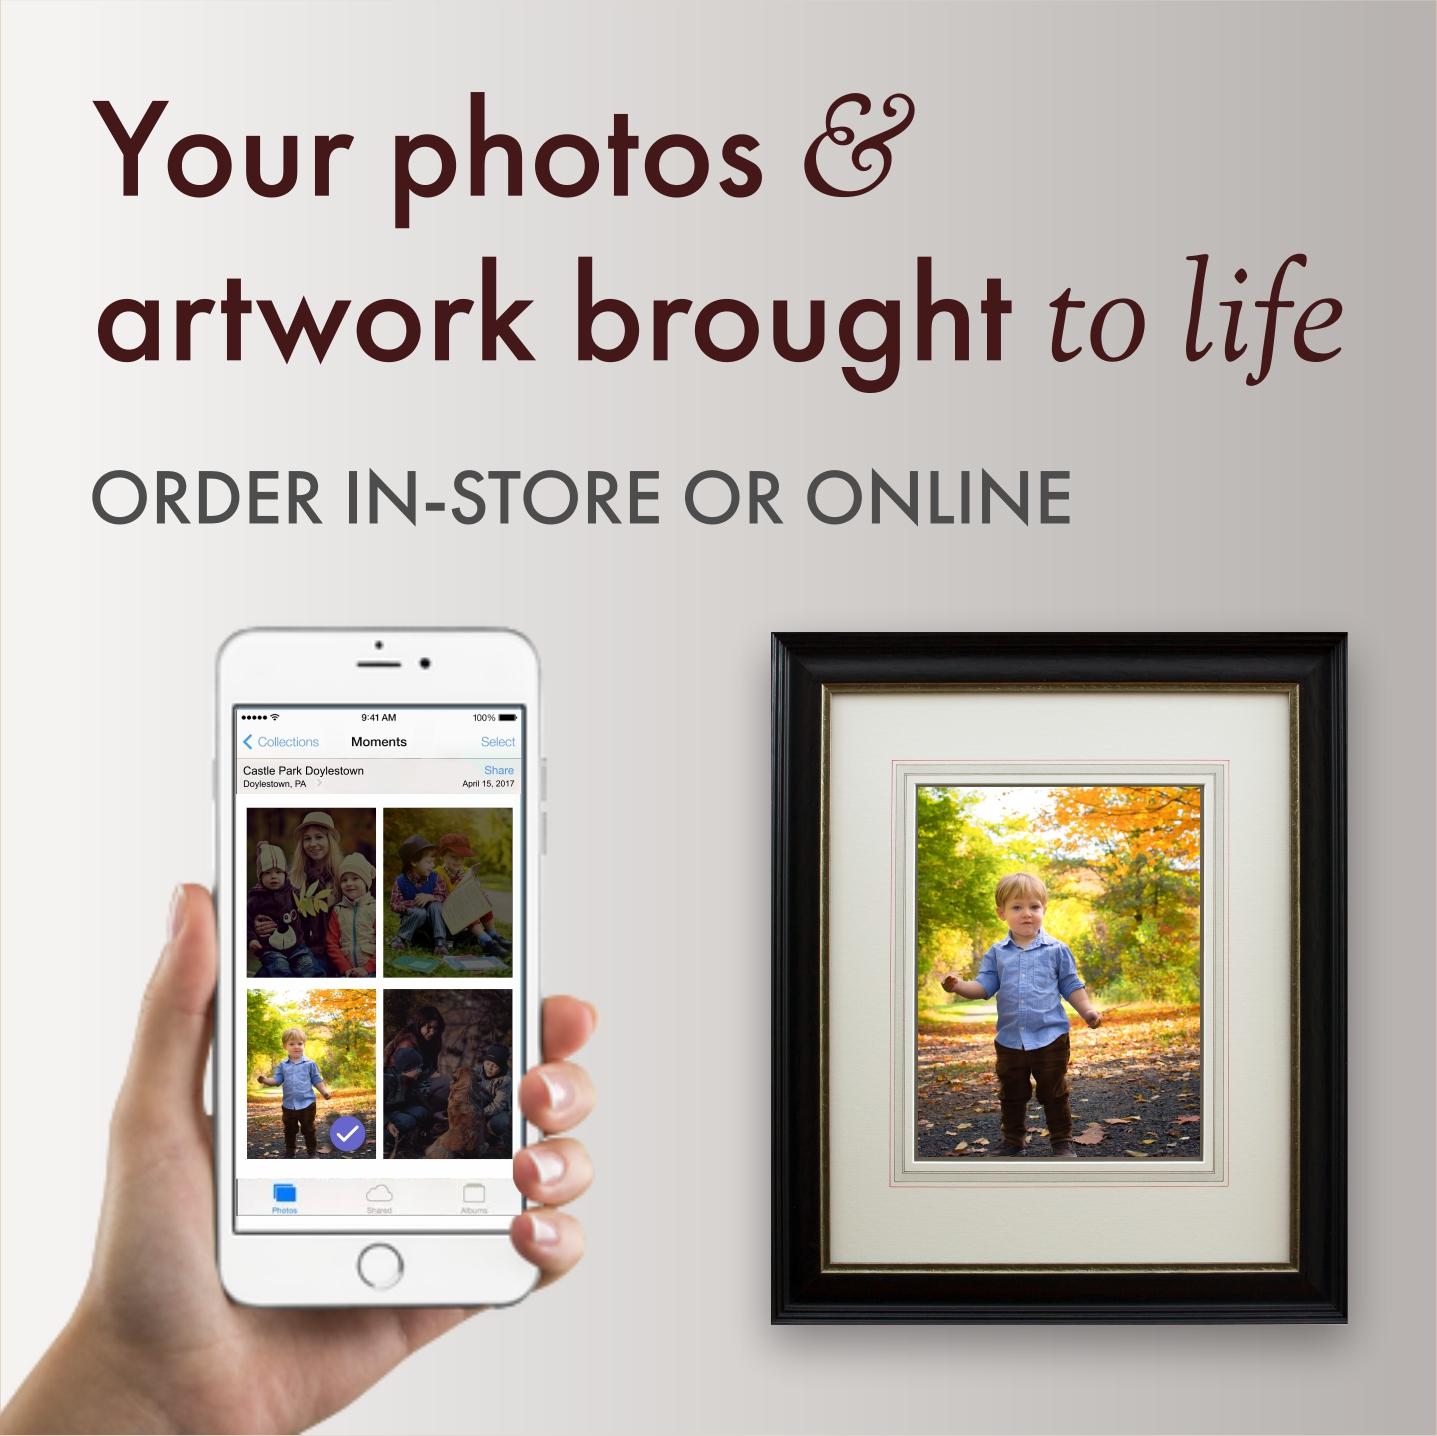 Art supply picture framing doylestown bucks county pa article promo image solutioingenieria Choice Image